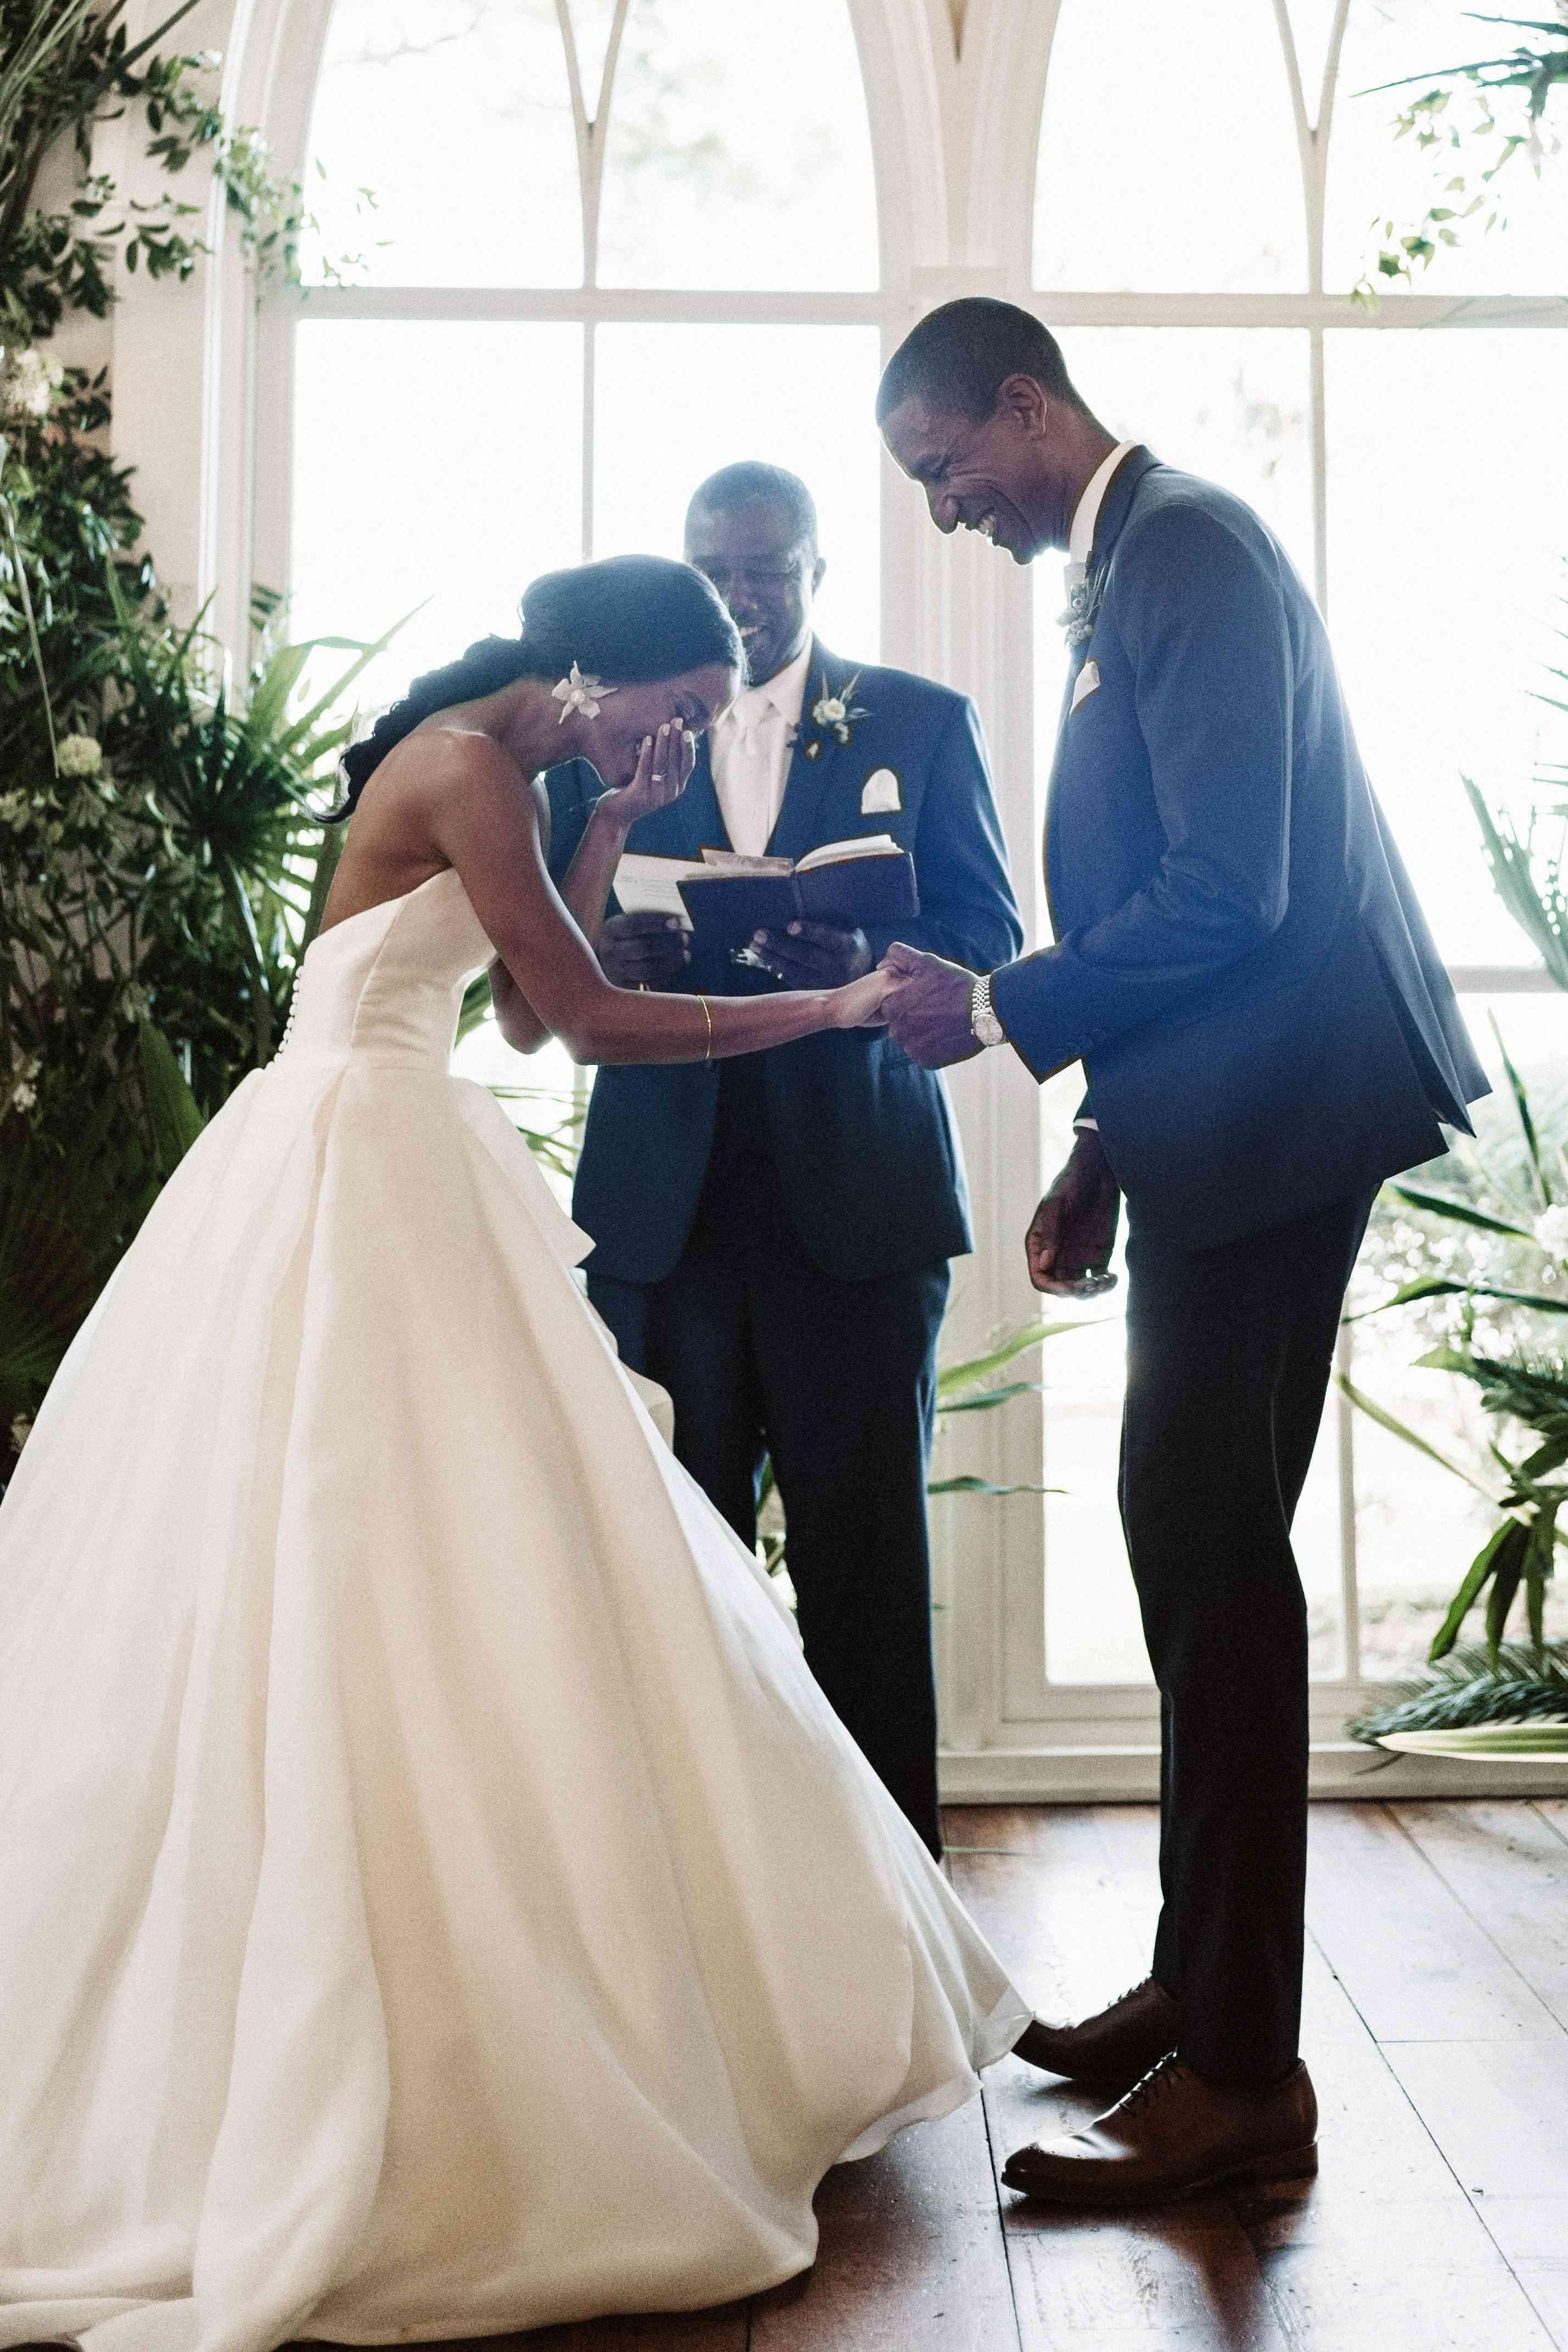 <p>couple during ceremony</p>